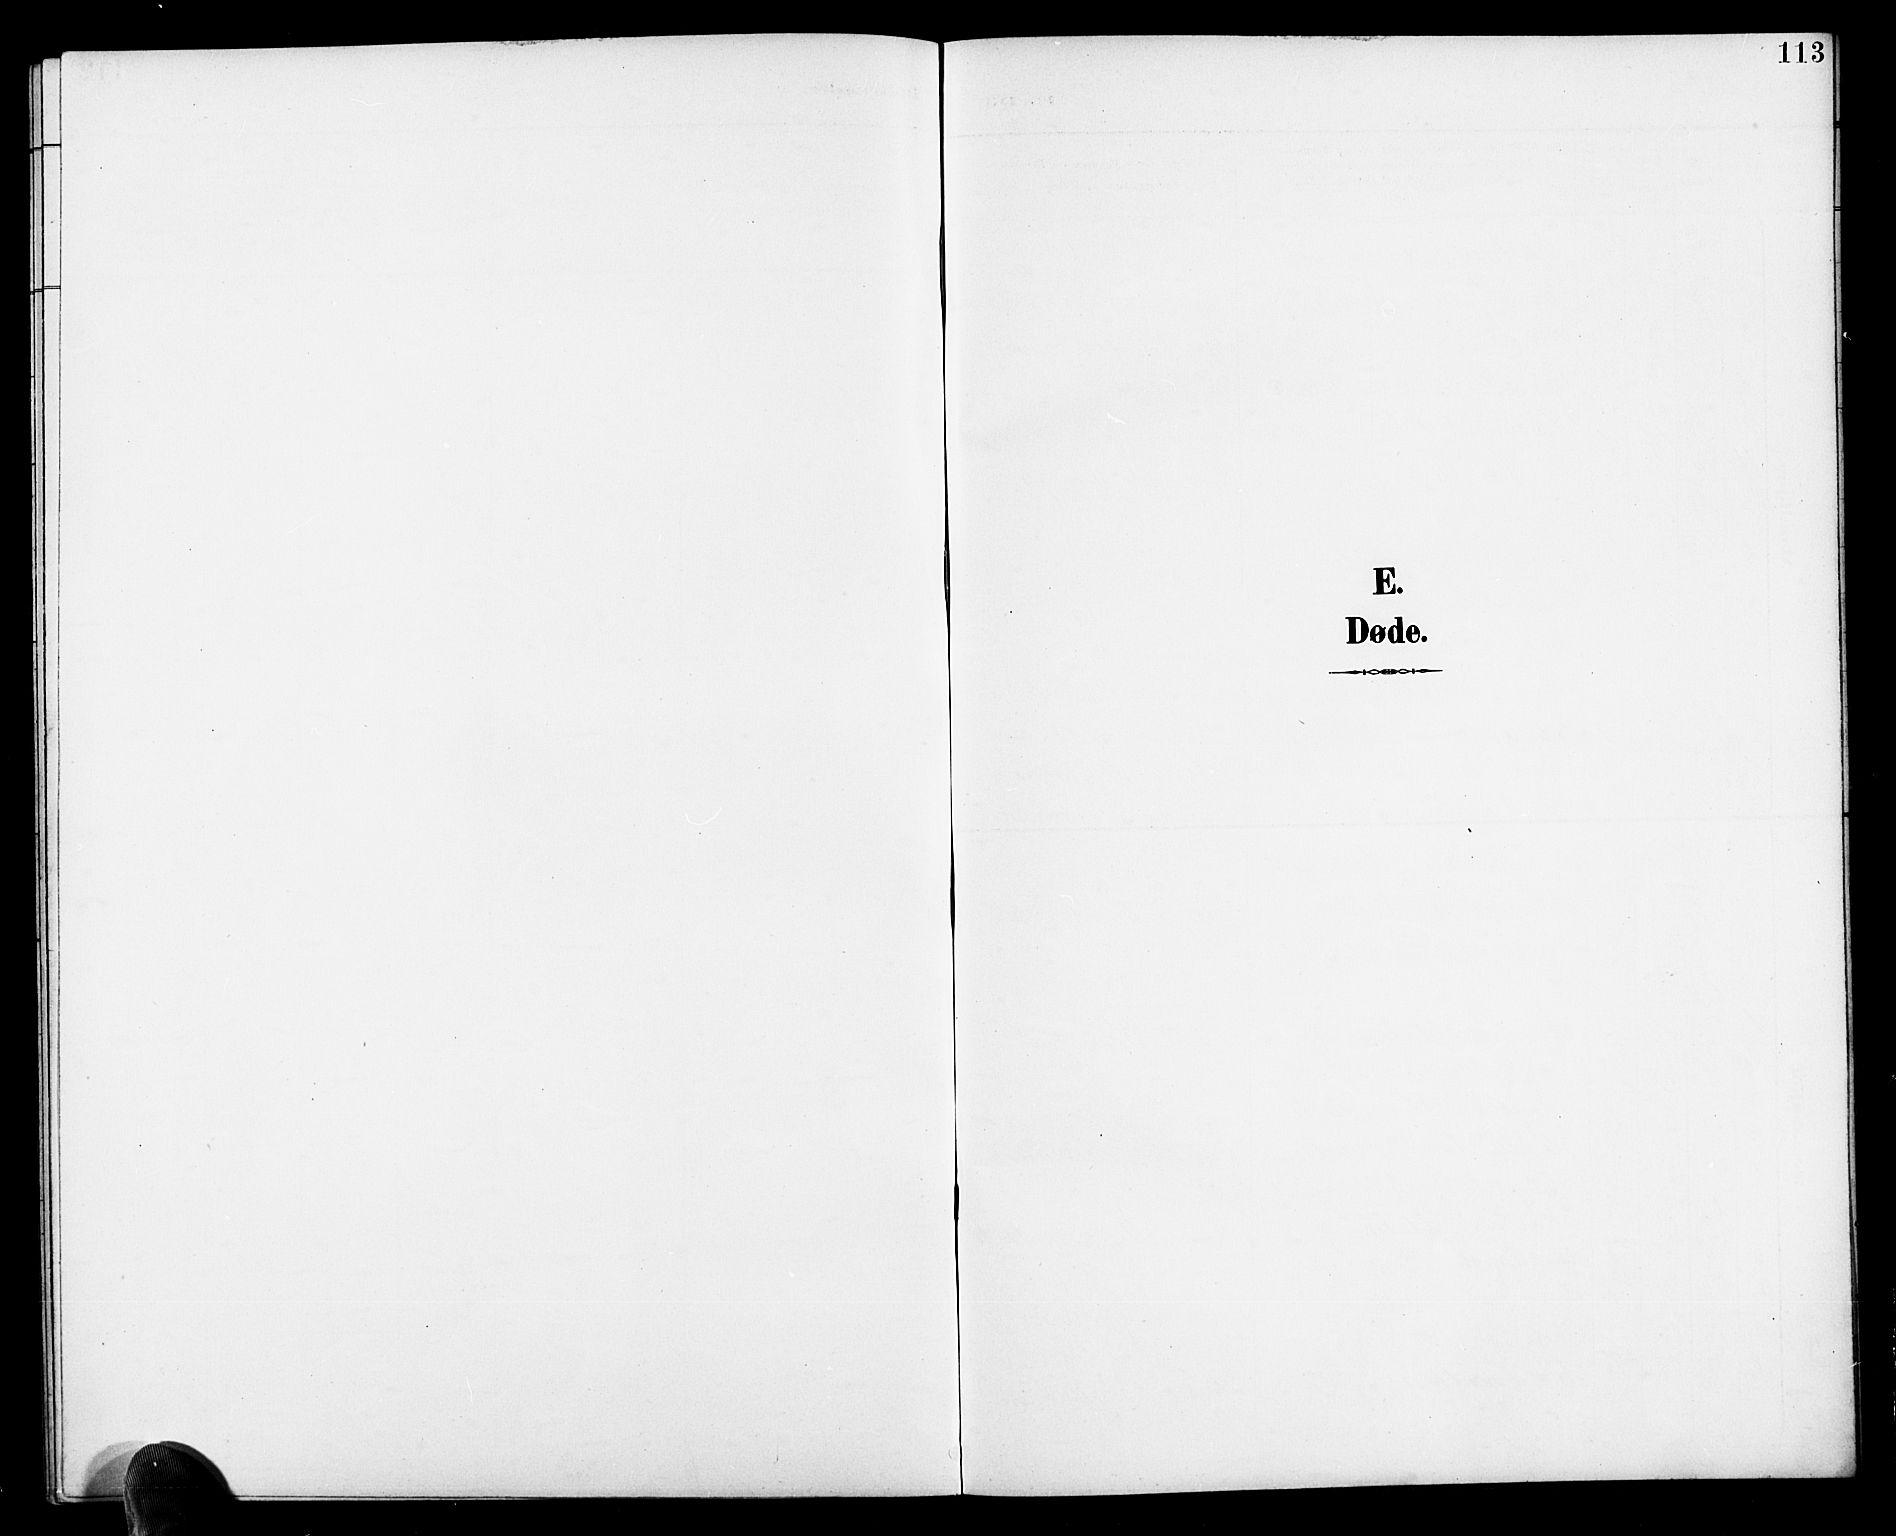 SAK, Herefoss sokneprestkontor, F/Fb/Fbb/L0003: Parish register (copy) no. B 3, 1892-1917, p. 113